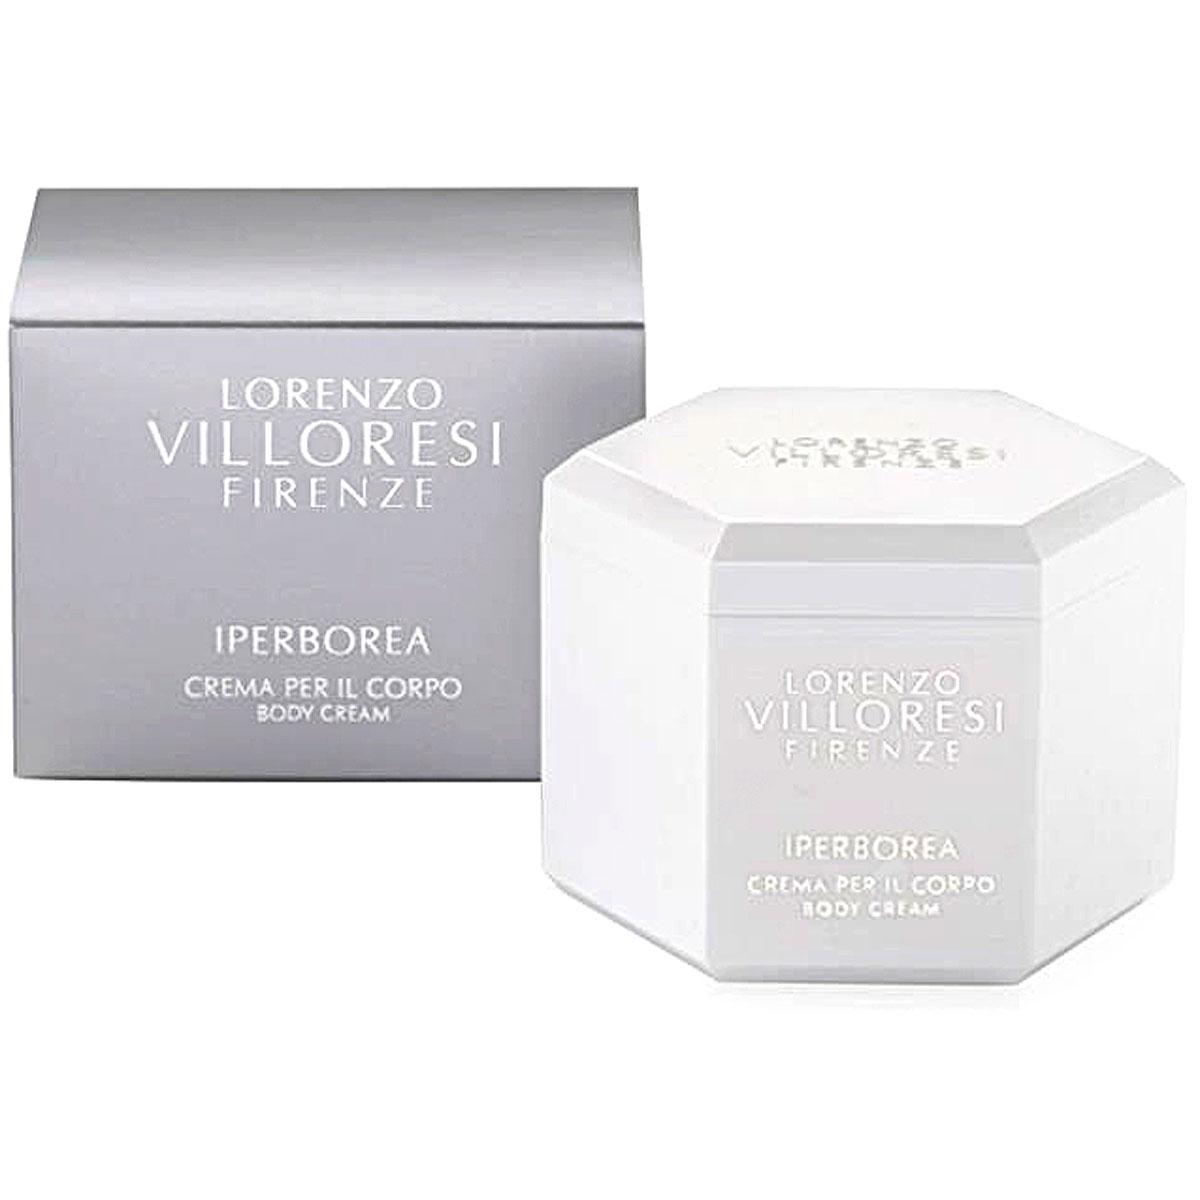 Lorenzo Villoresi Beauty for Men, Iperborea - Body Cream - 200 Ml, 2019, 200 ml